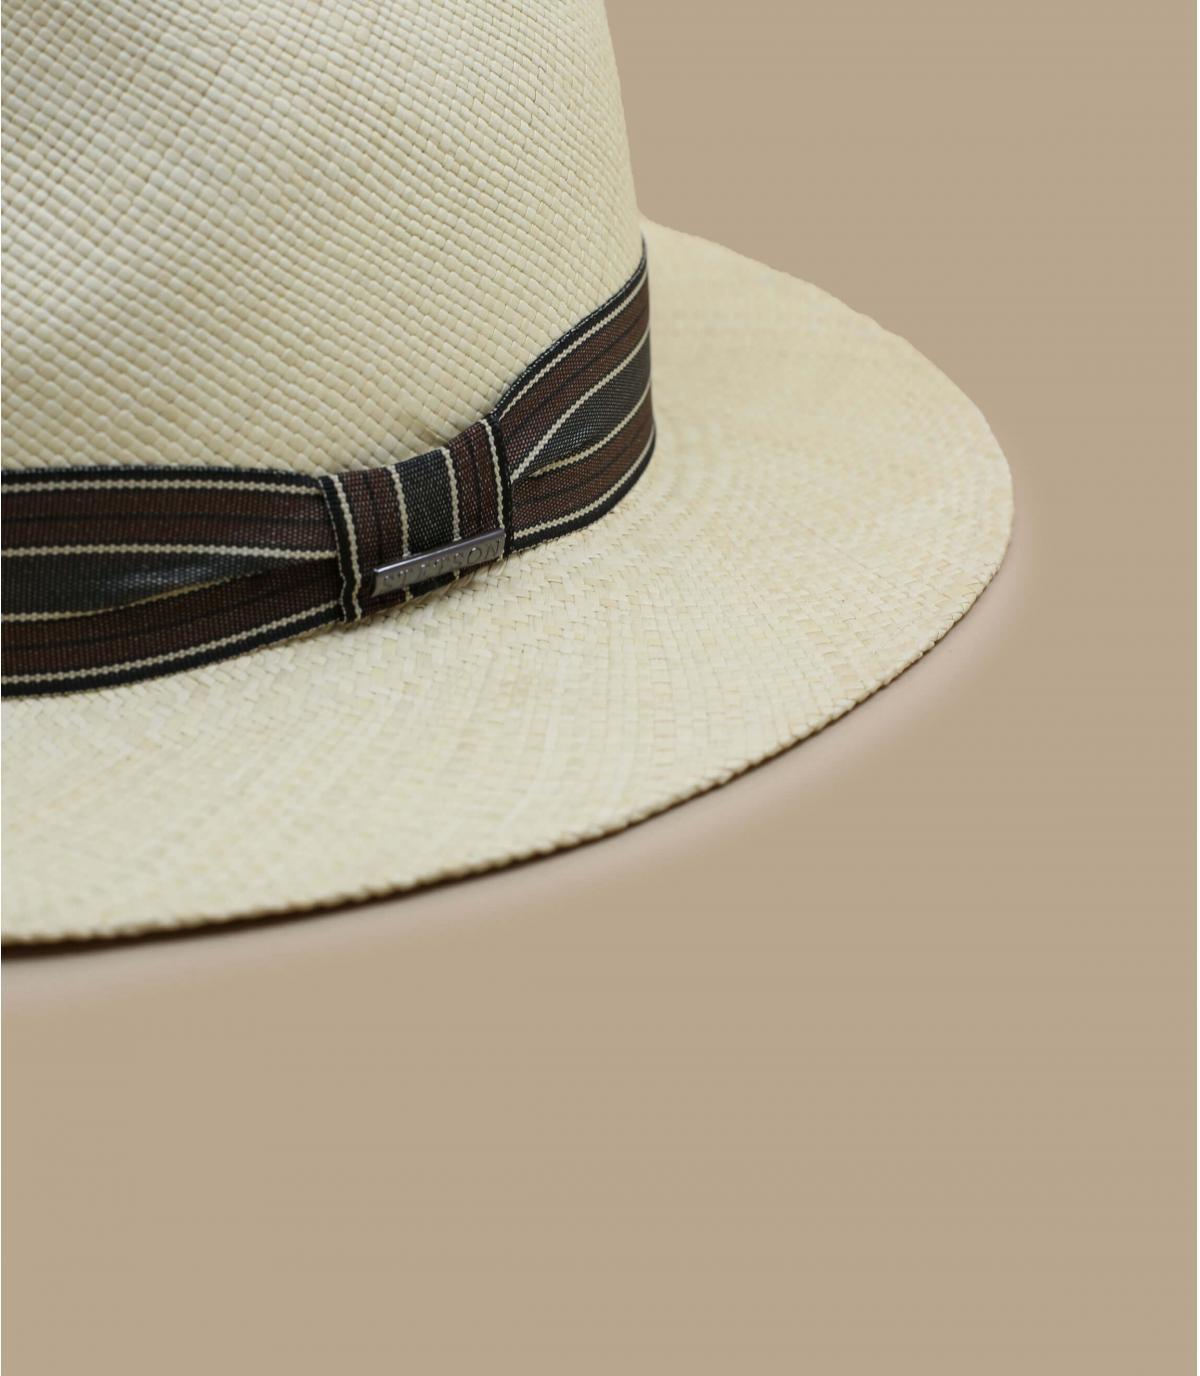 Dettagli Fedora Panama natural - image 3